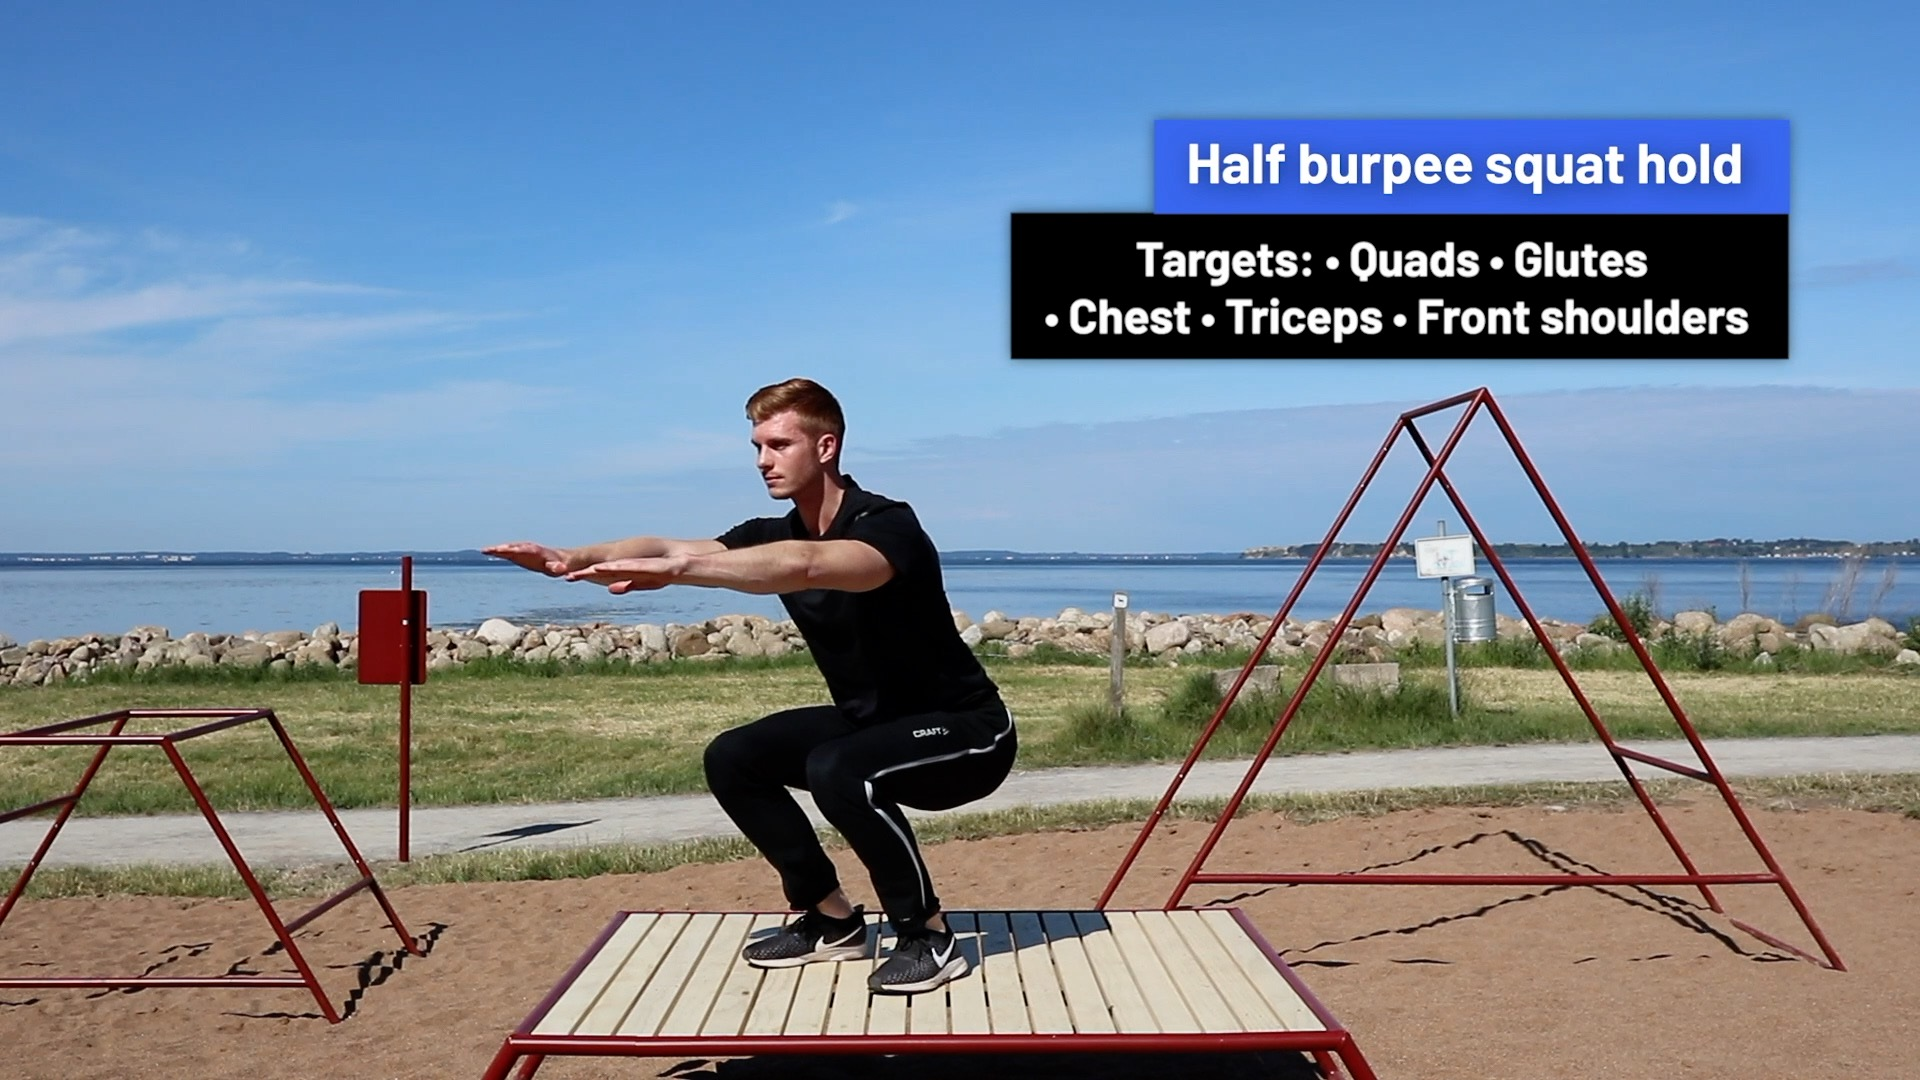 Half burpee squat hold